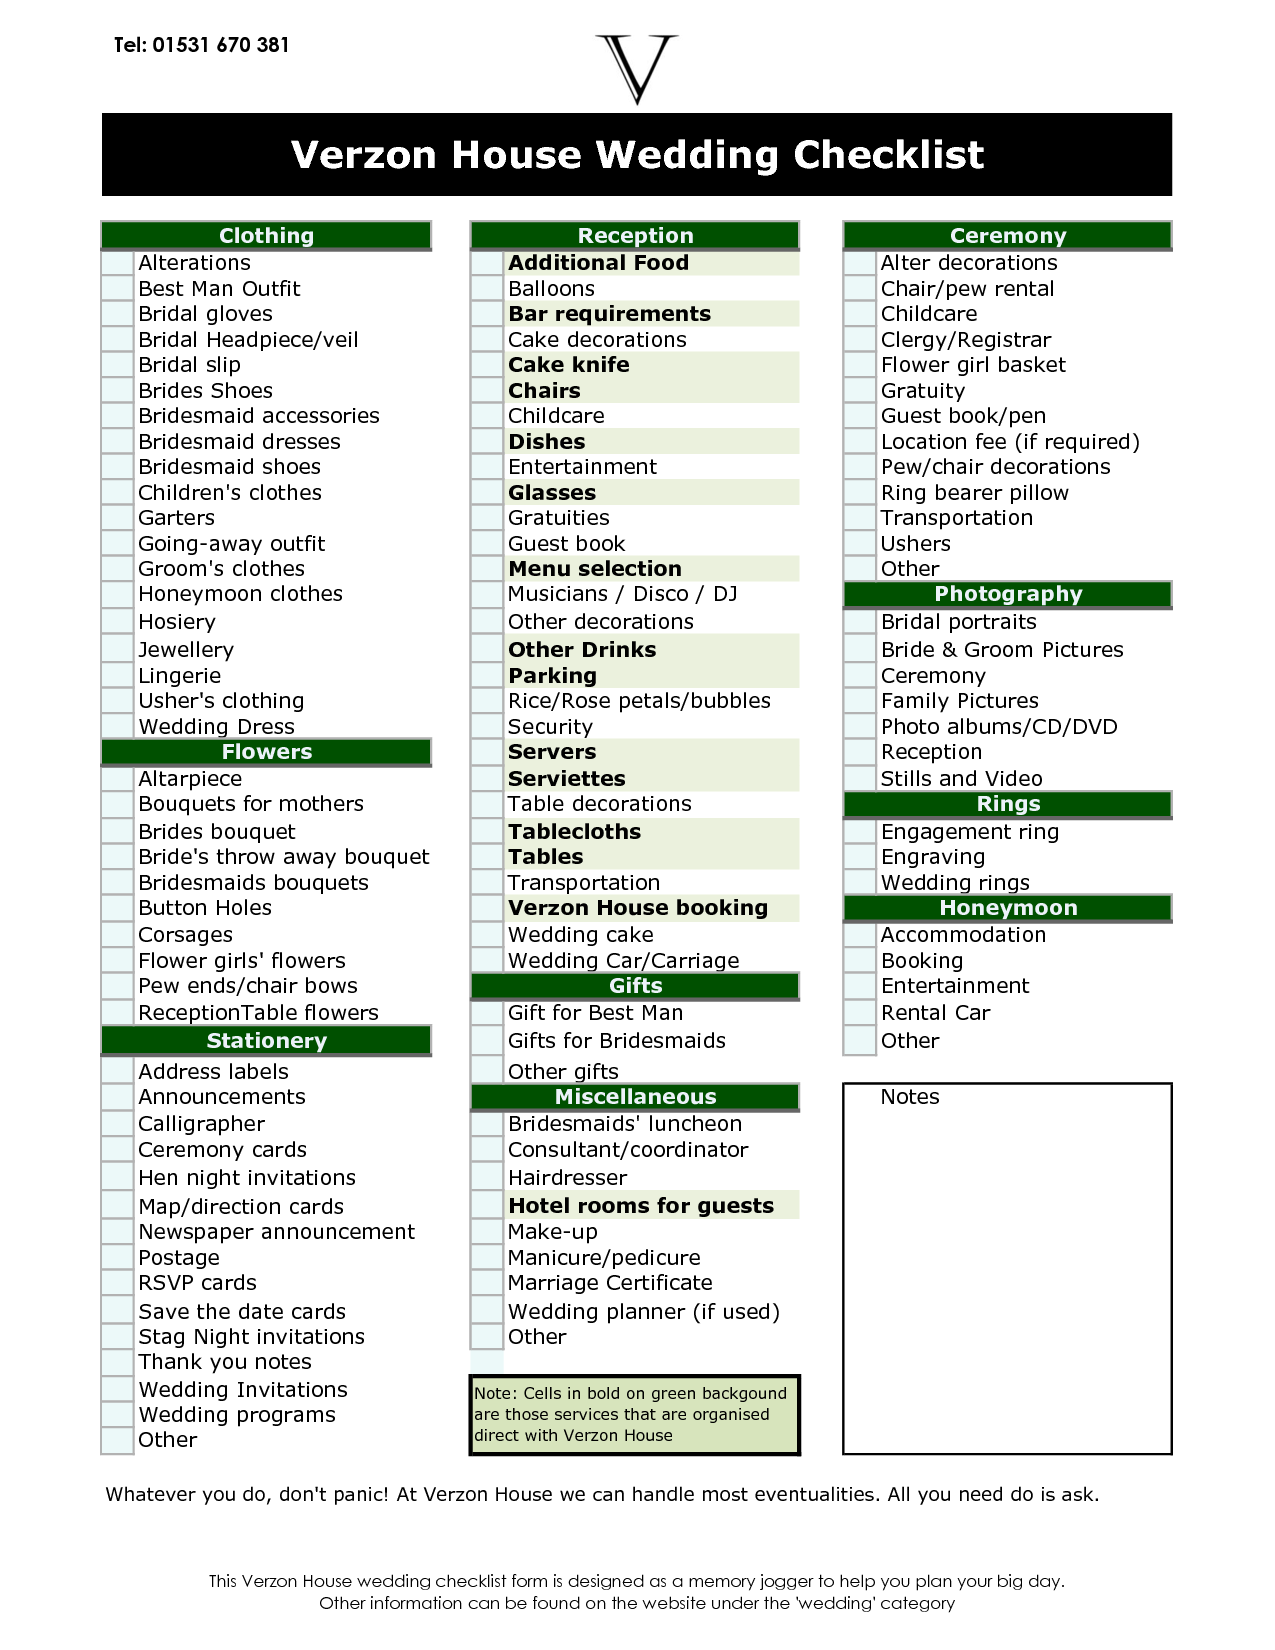 Wedding ceremony checklist wedding checklist tel 01531 670 381 wedding ceremony checklist wedding checklist tel 01531 670 381 verzon house wedding checklist junglespirit Gallery